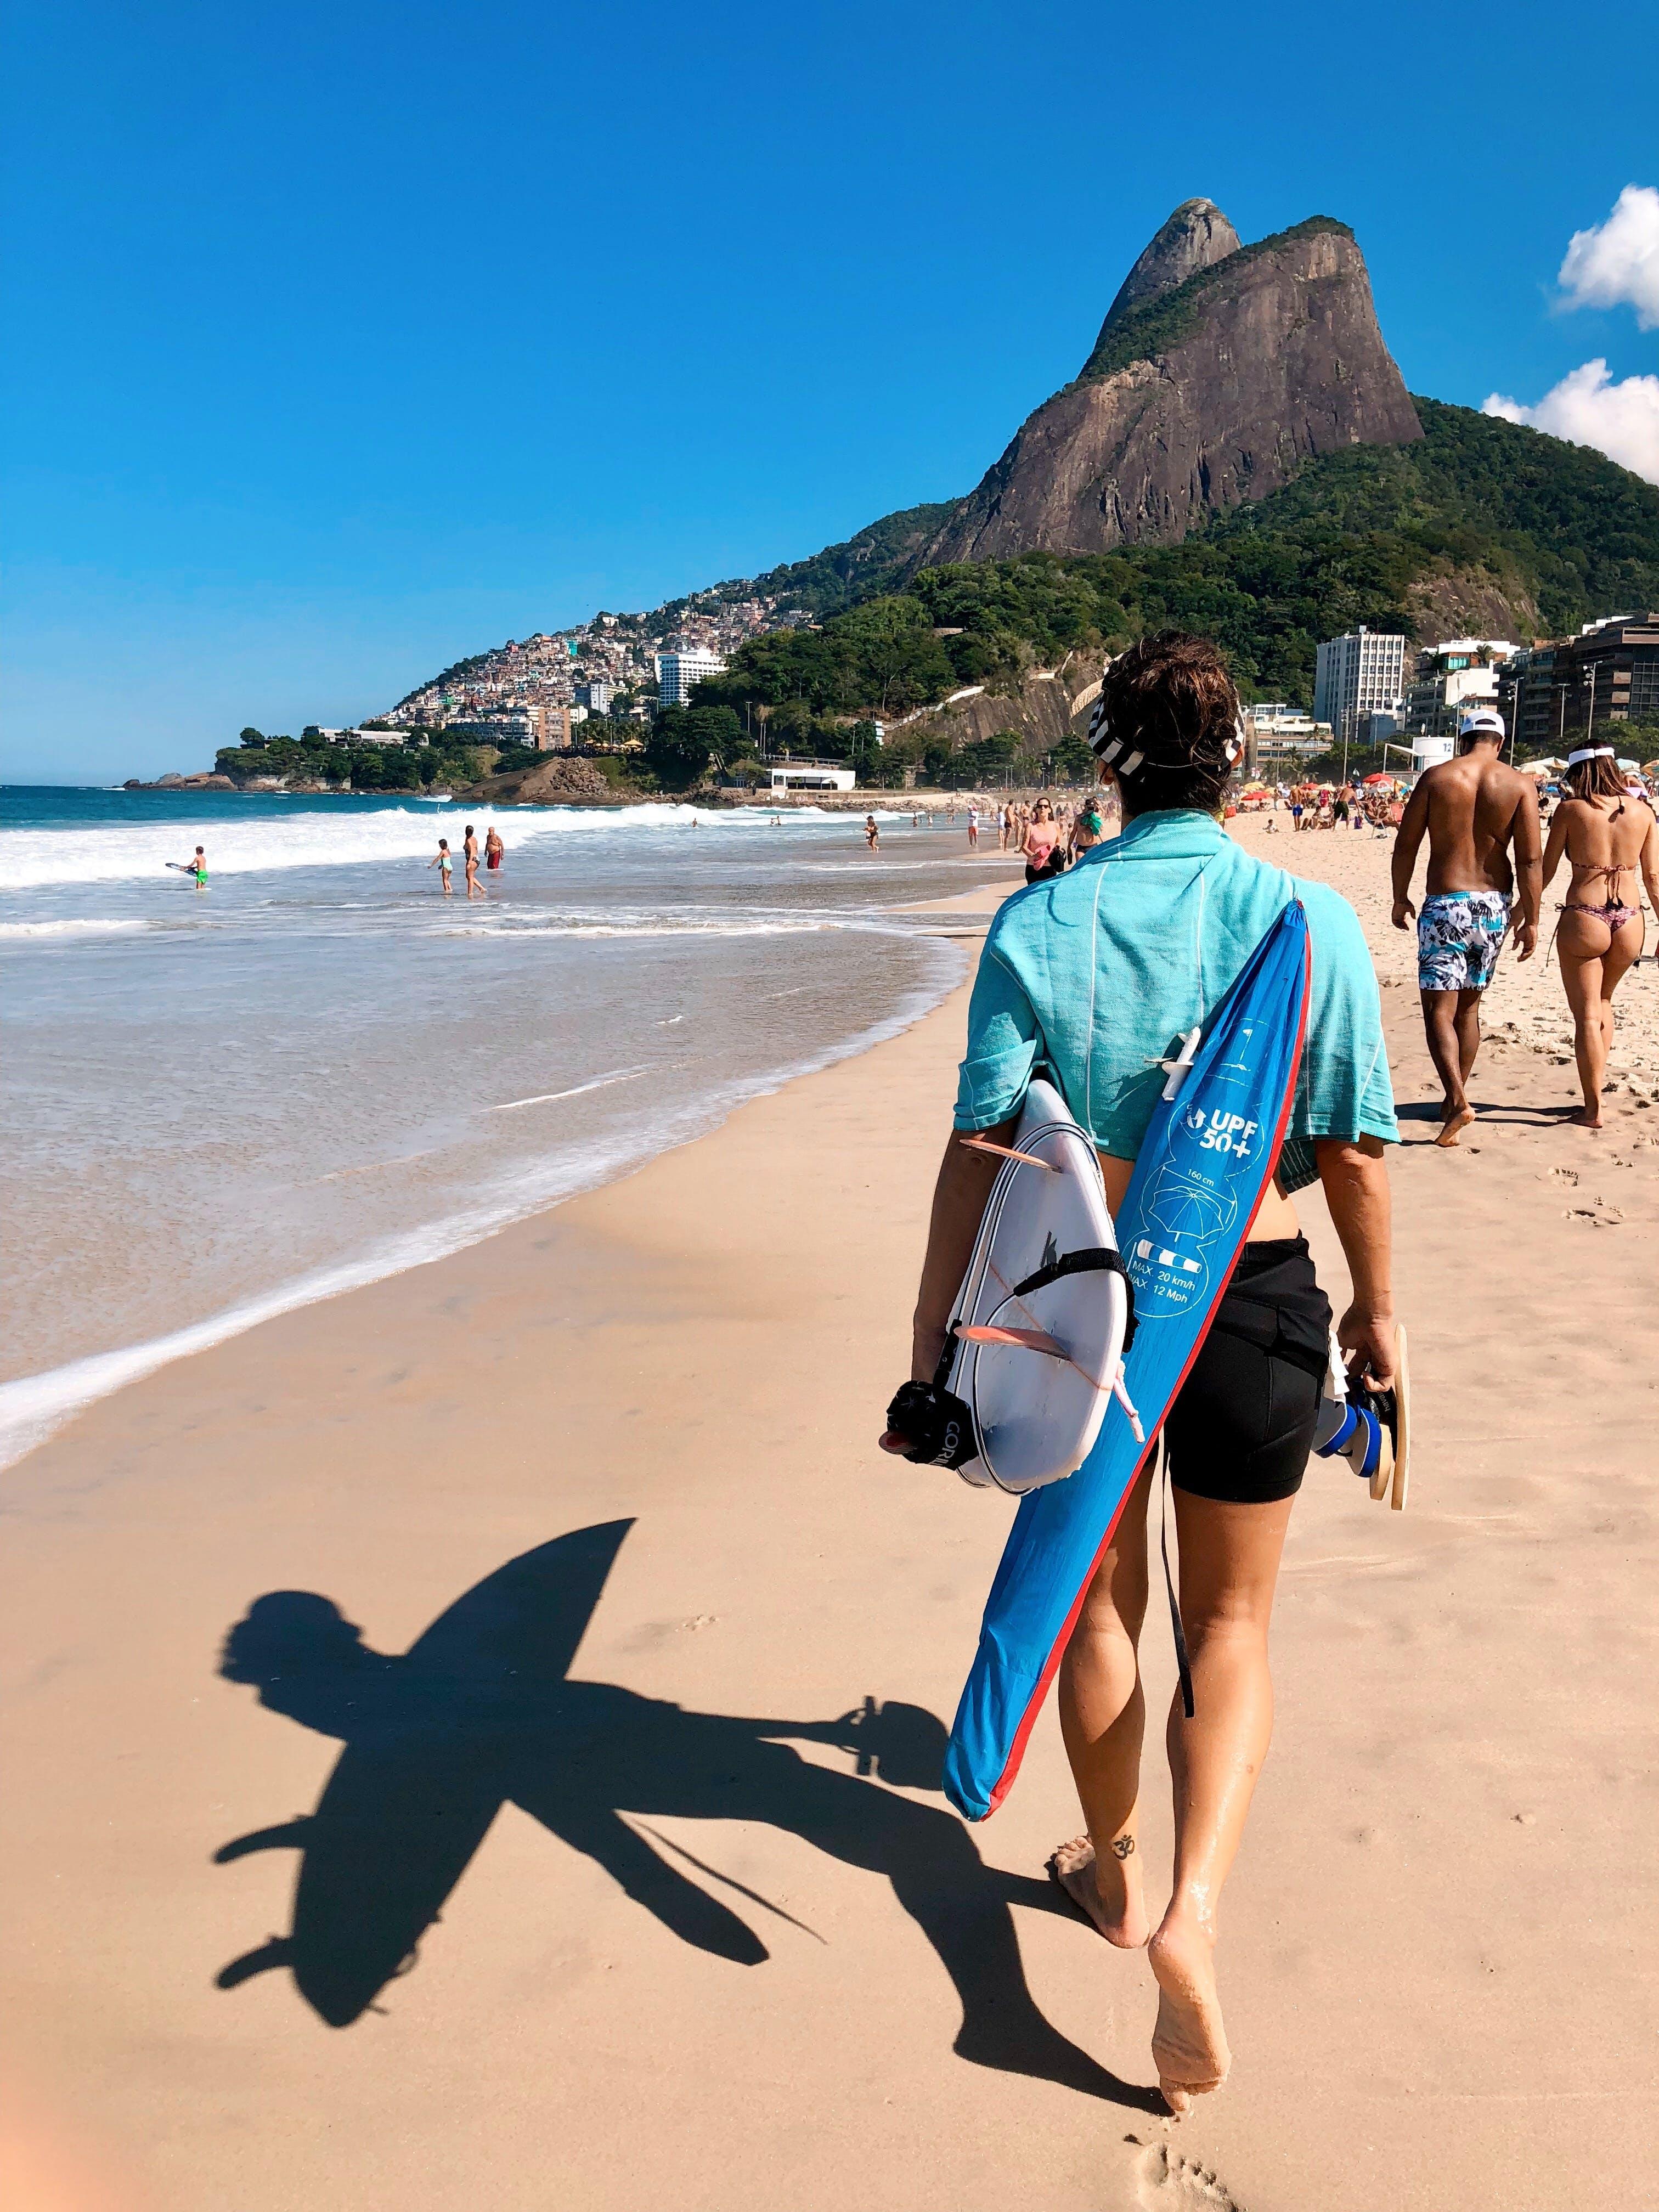 Kostenloses Stock Foto zu barfuß, brasilien, erholung, ferien